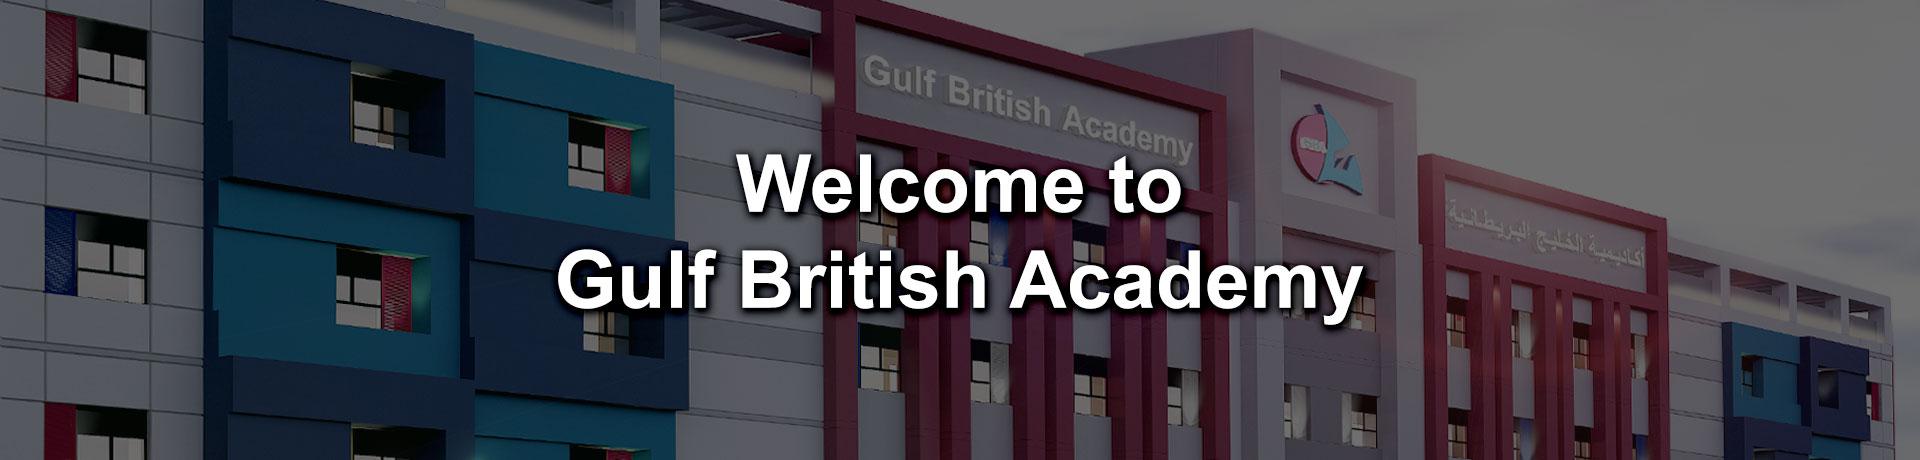 Welcome to Gulf British Academy